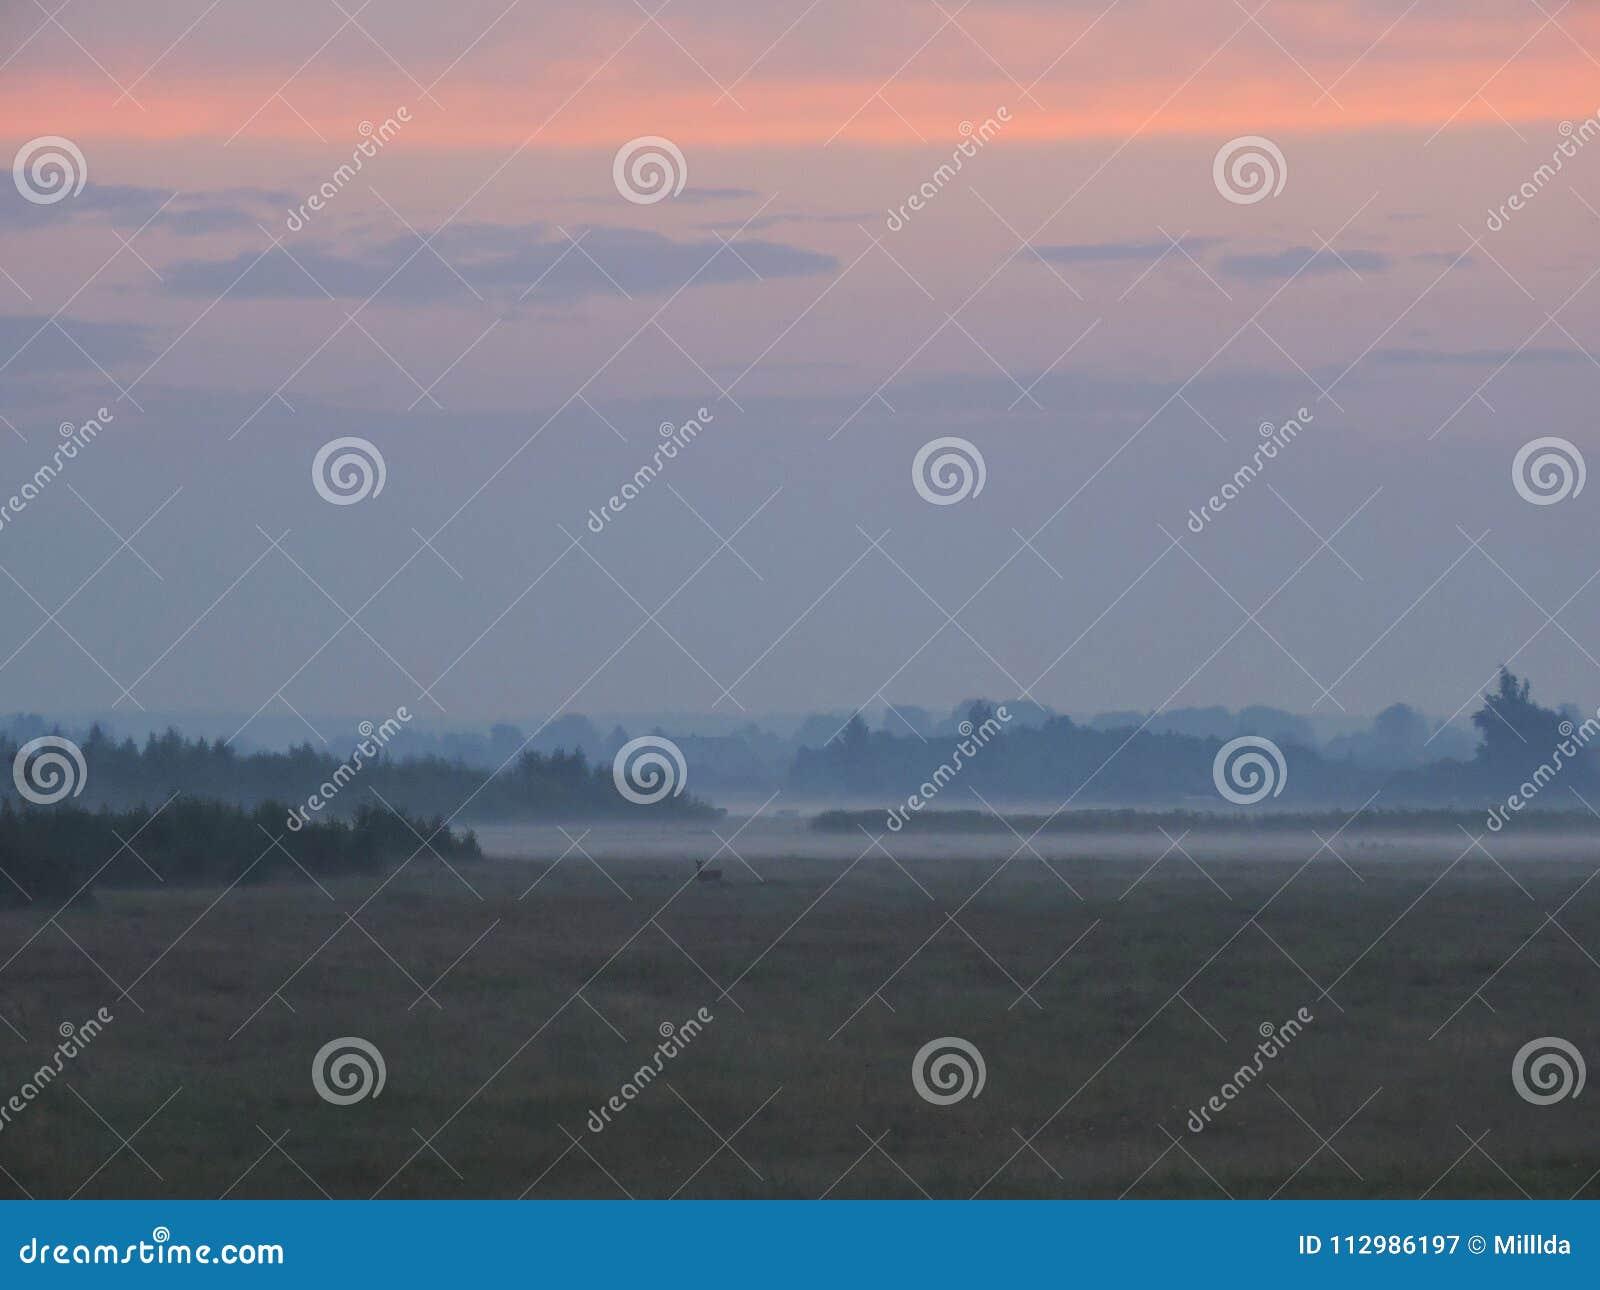 Landscape in sunrise colors, Lithuania